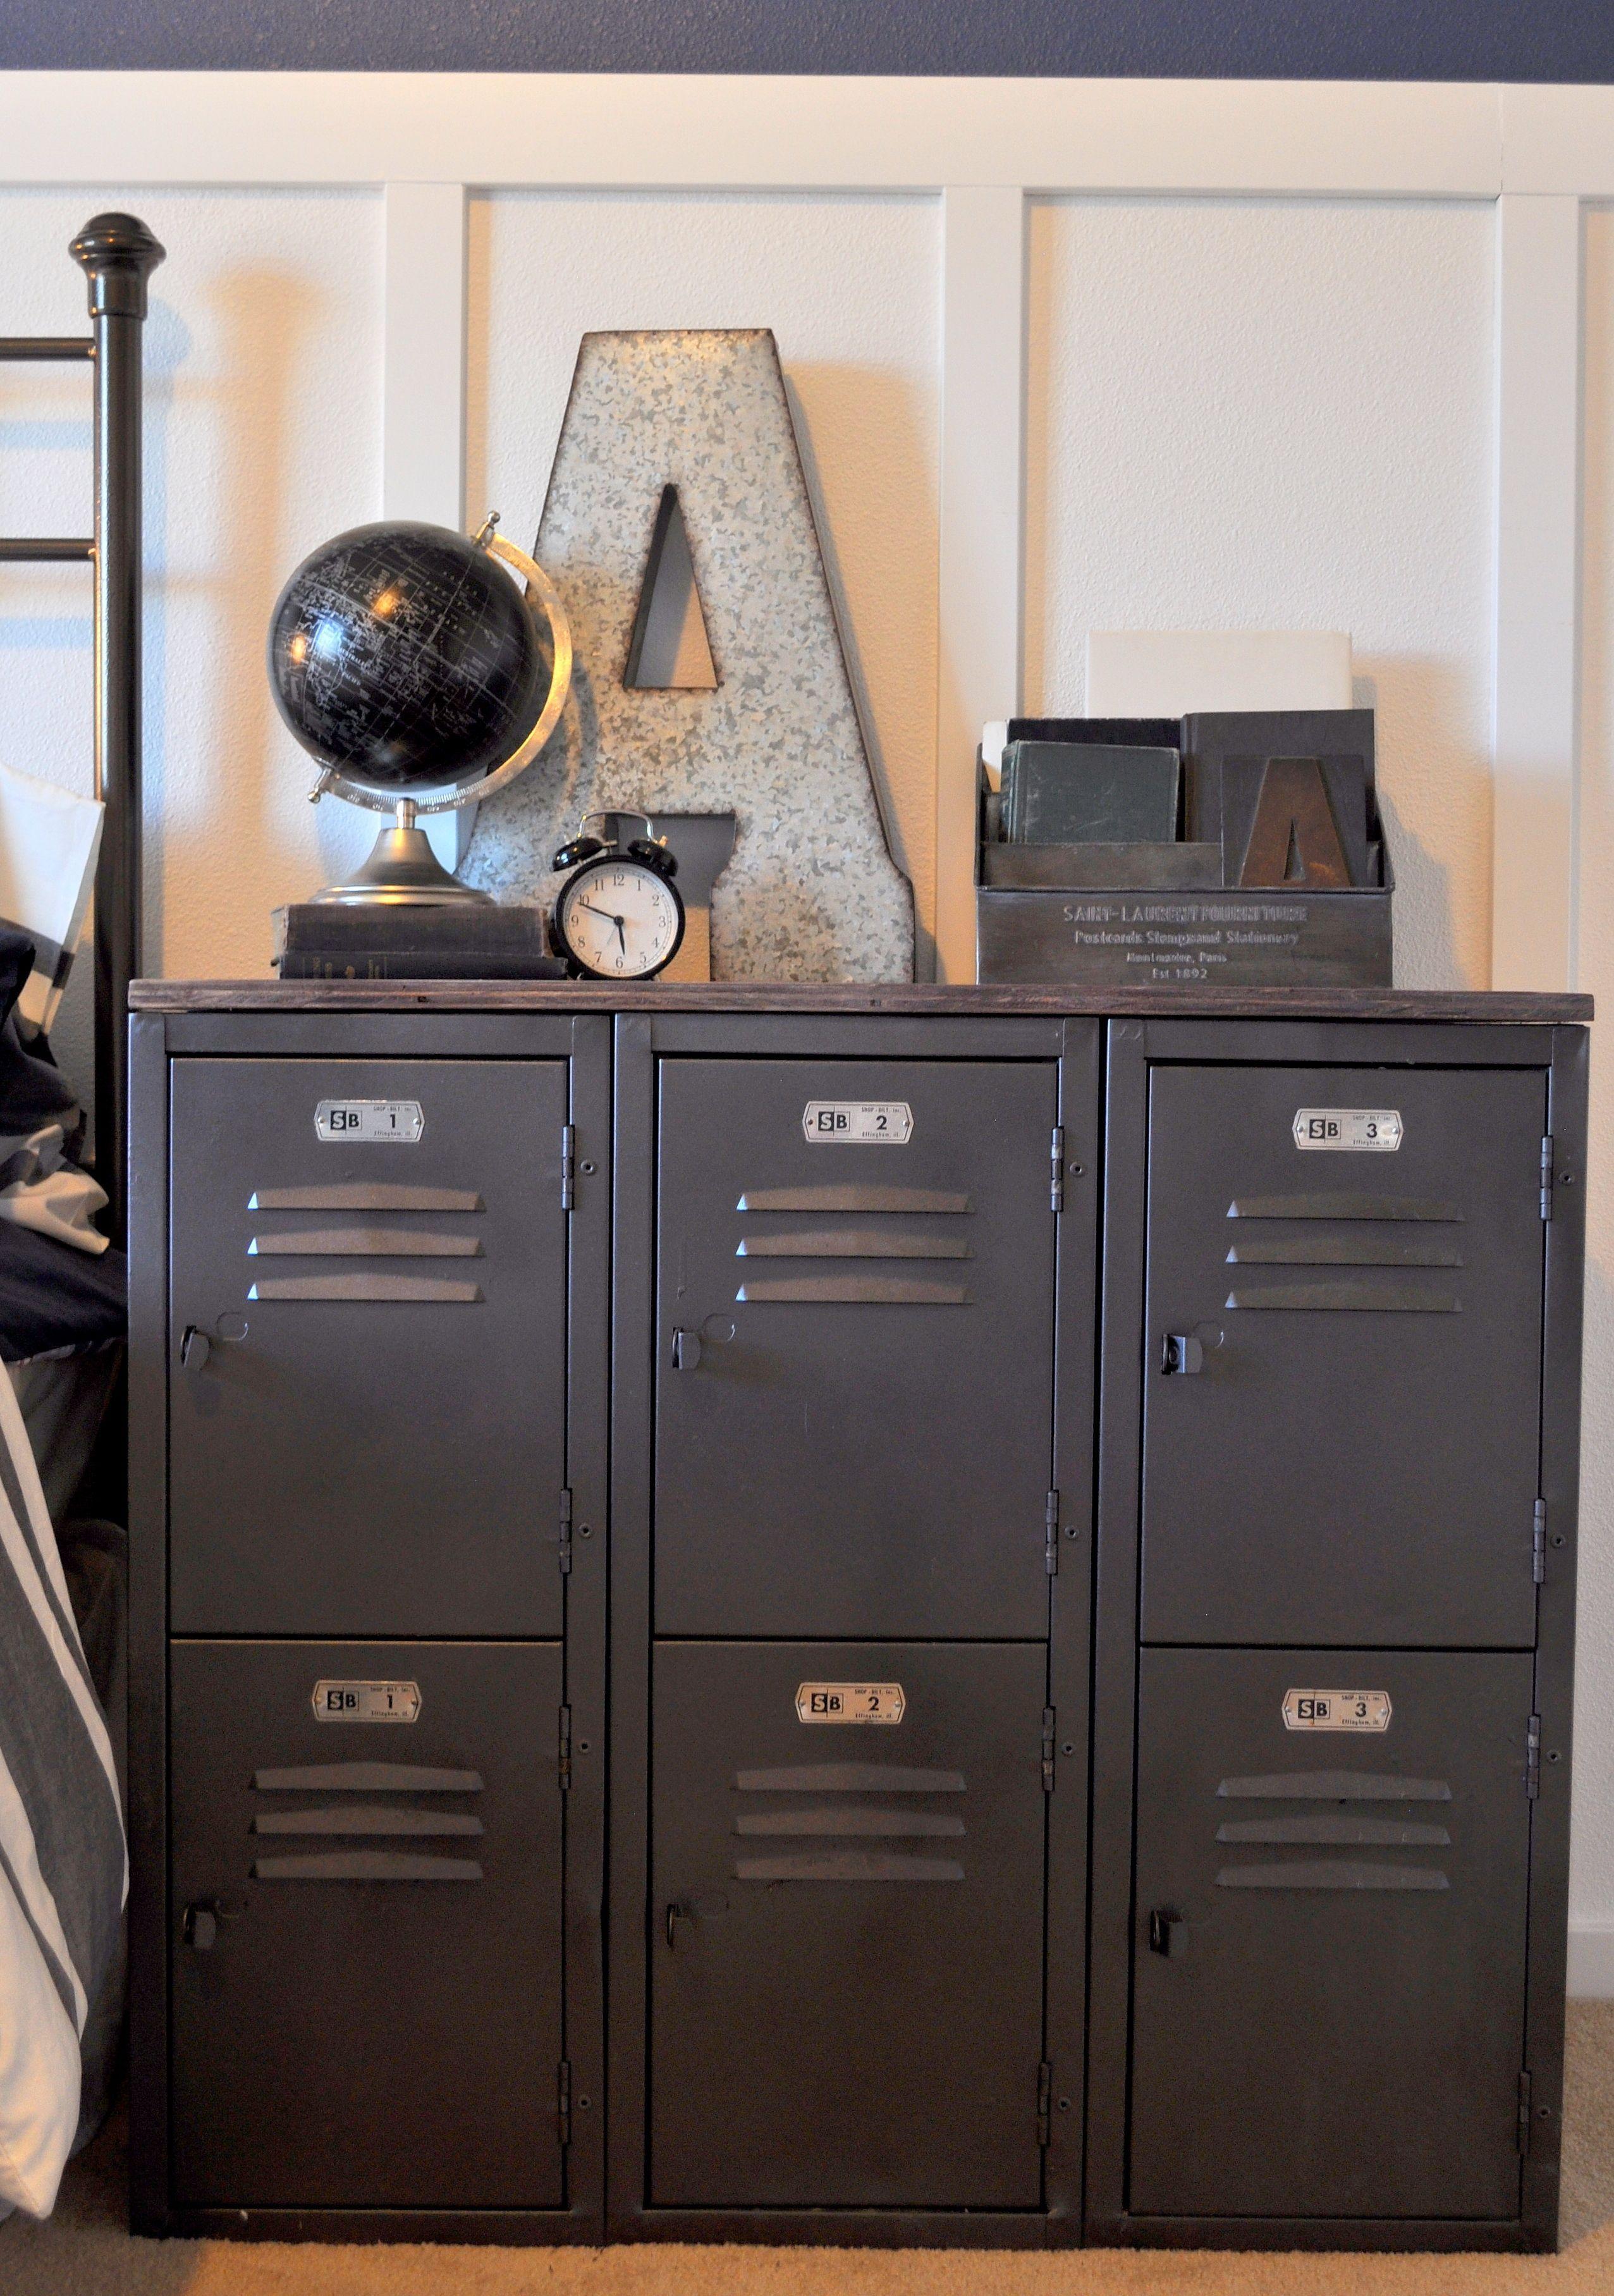 Vintage Locker Rehab Follow on Instagram @aundraskinner #lockers in ...